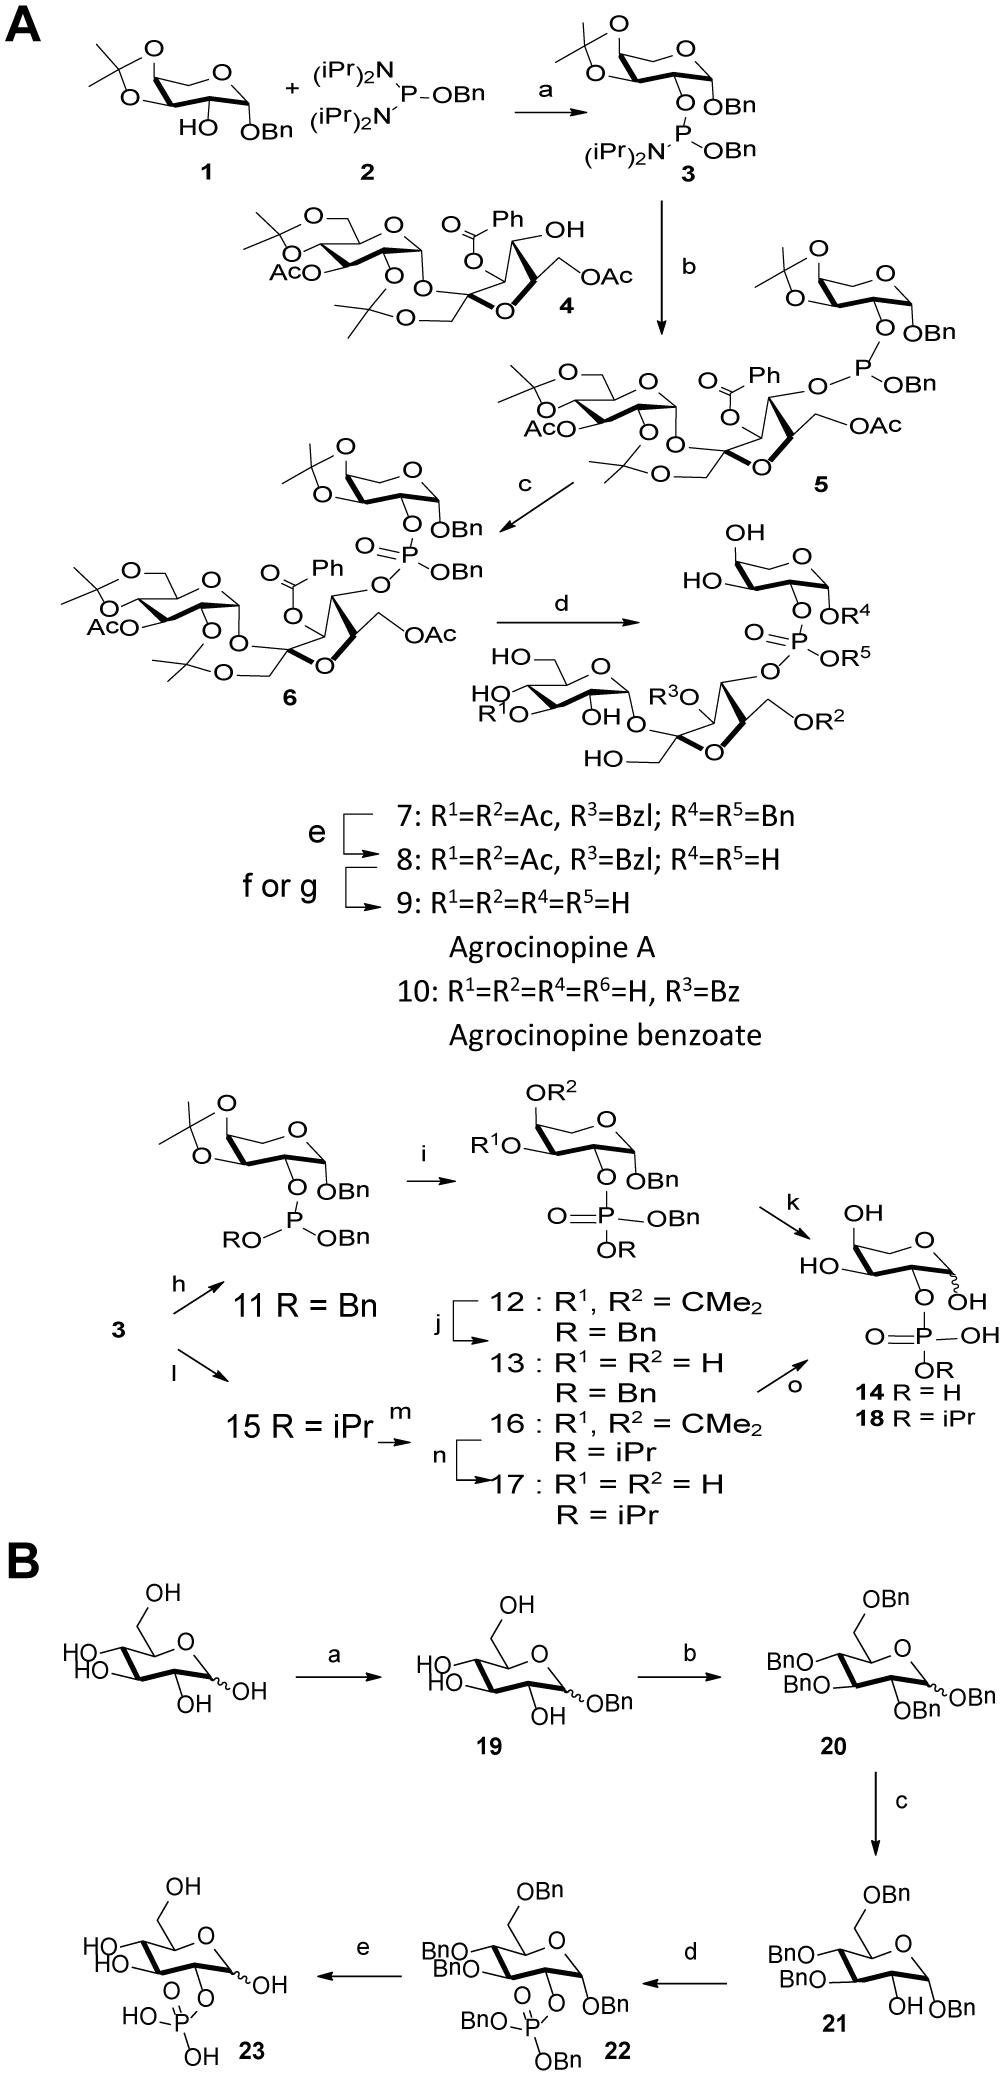 Synthesis scheme.